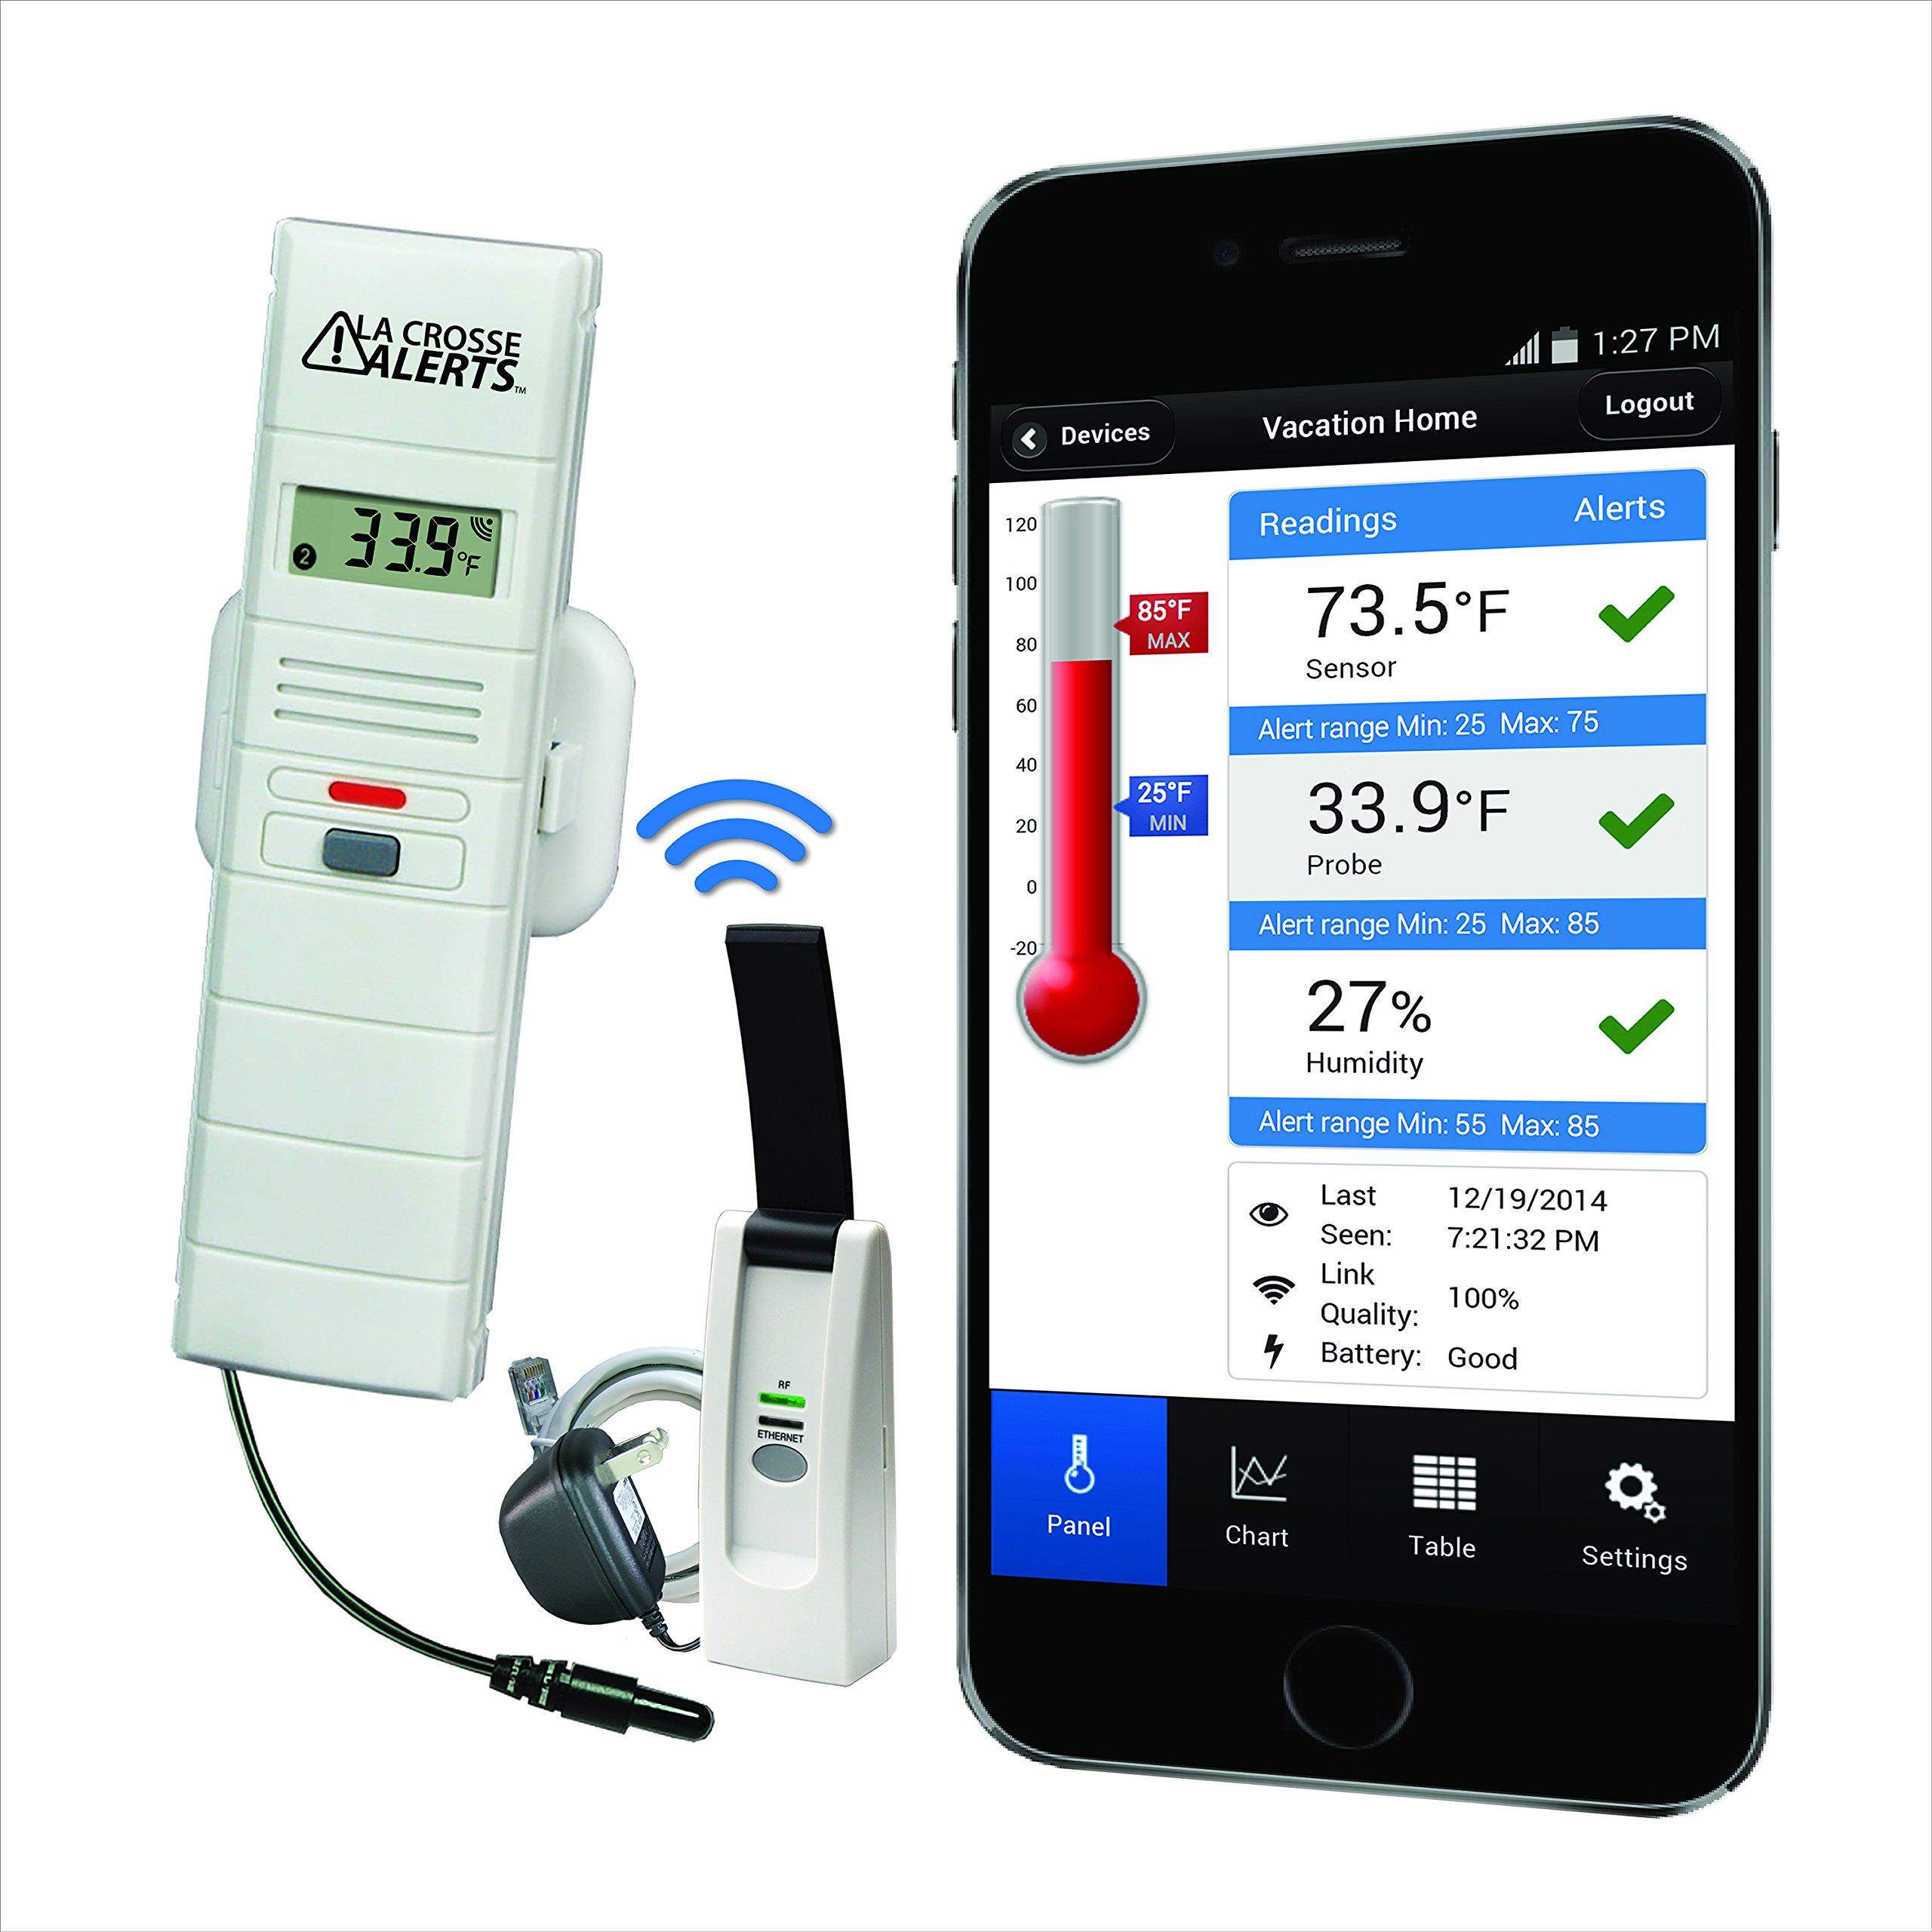 Crosse Alerts 926 25101 GP Wireless Monitor